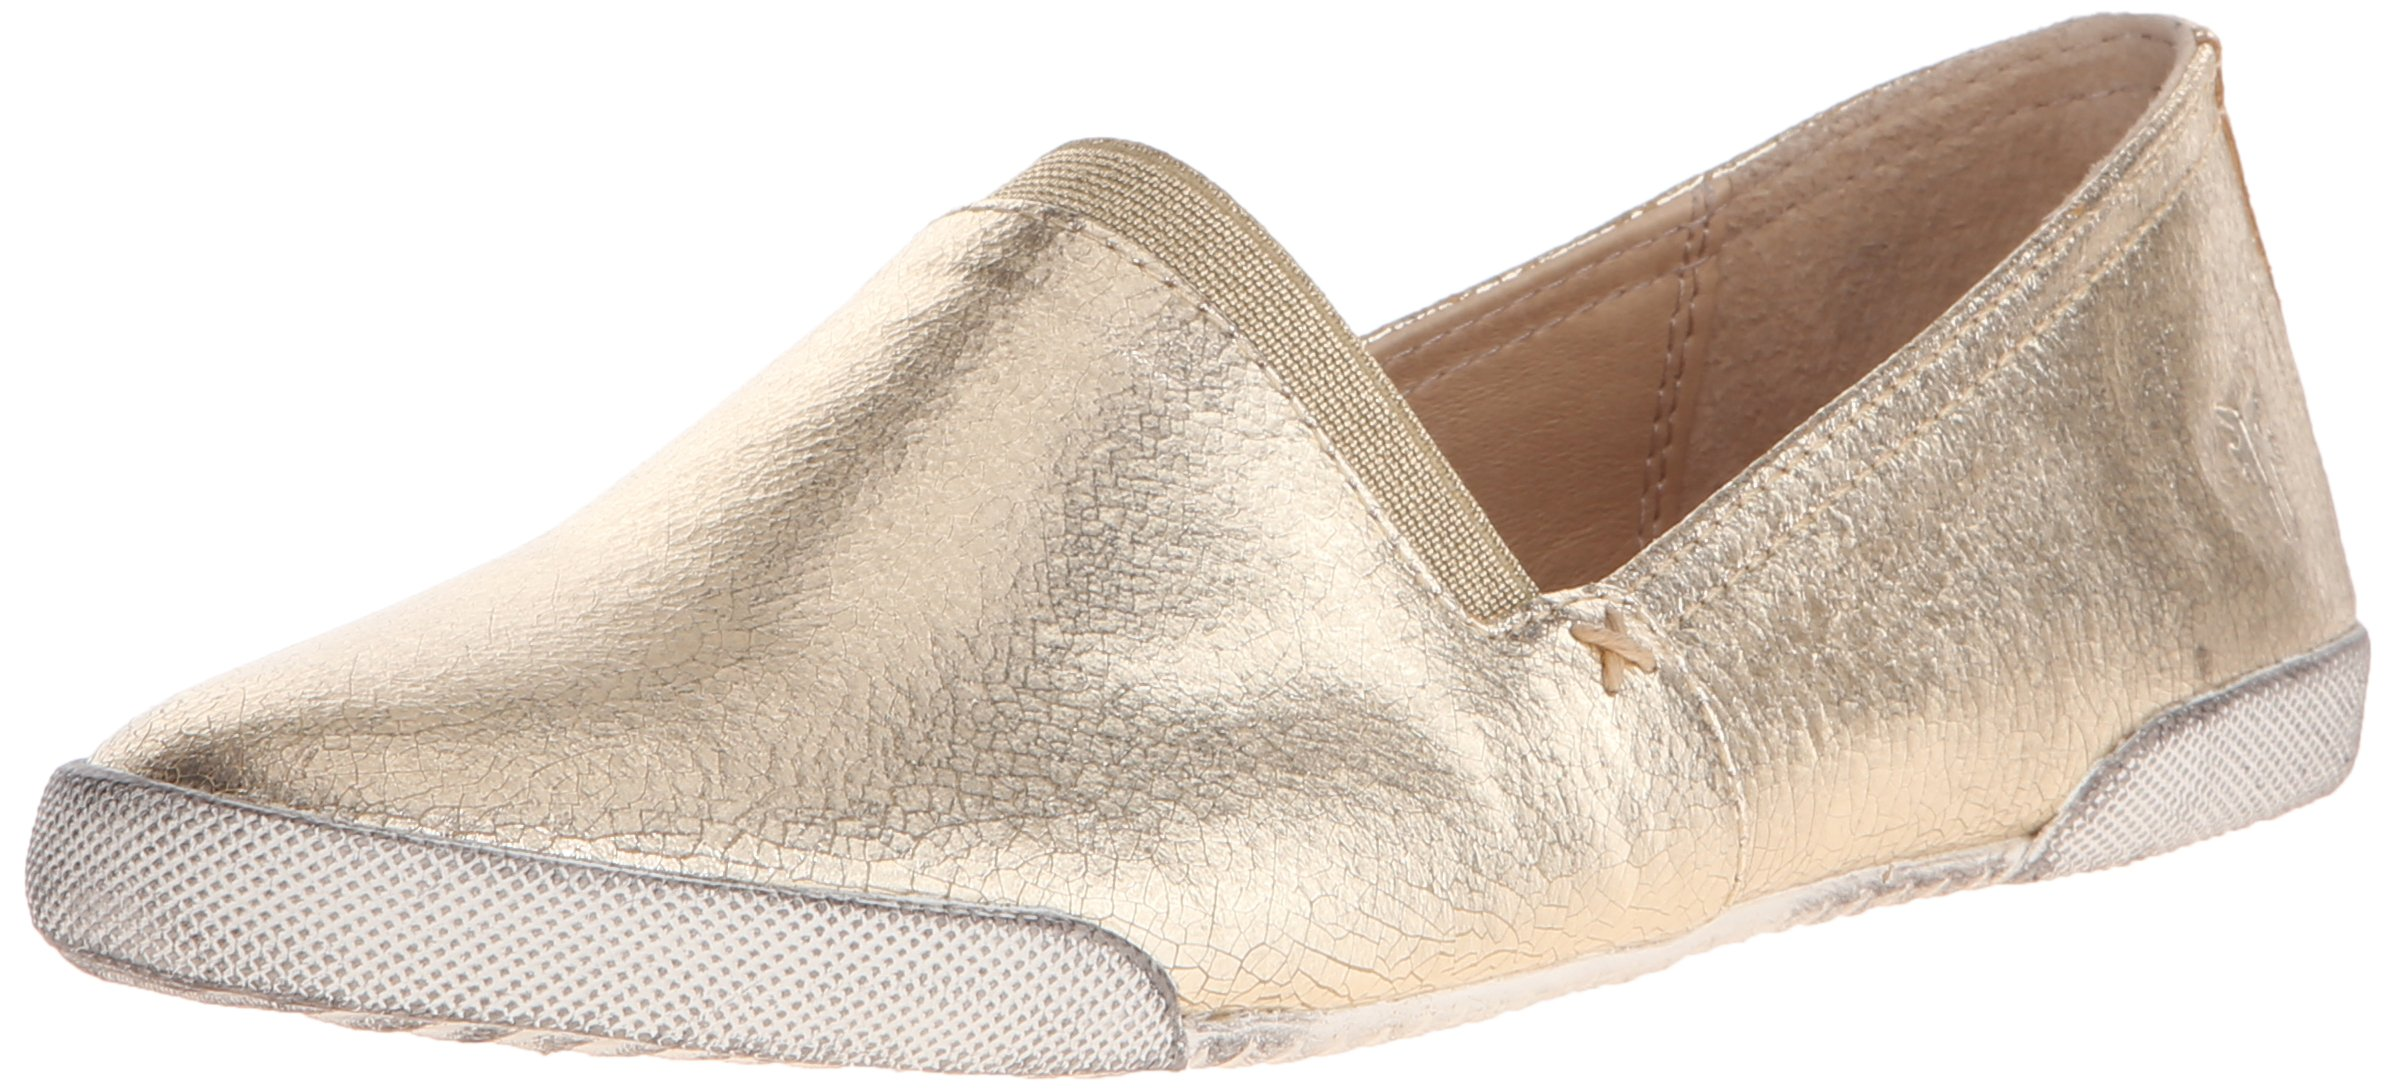 FRYE Women's Melanie Slip On Fashion Sneaker, Gold/Metallic Leather, 7.5 M US